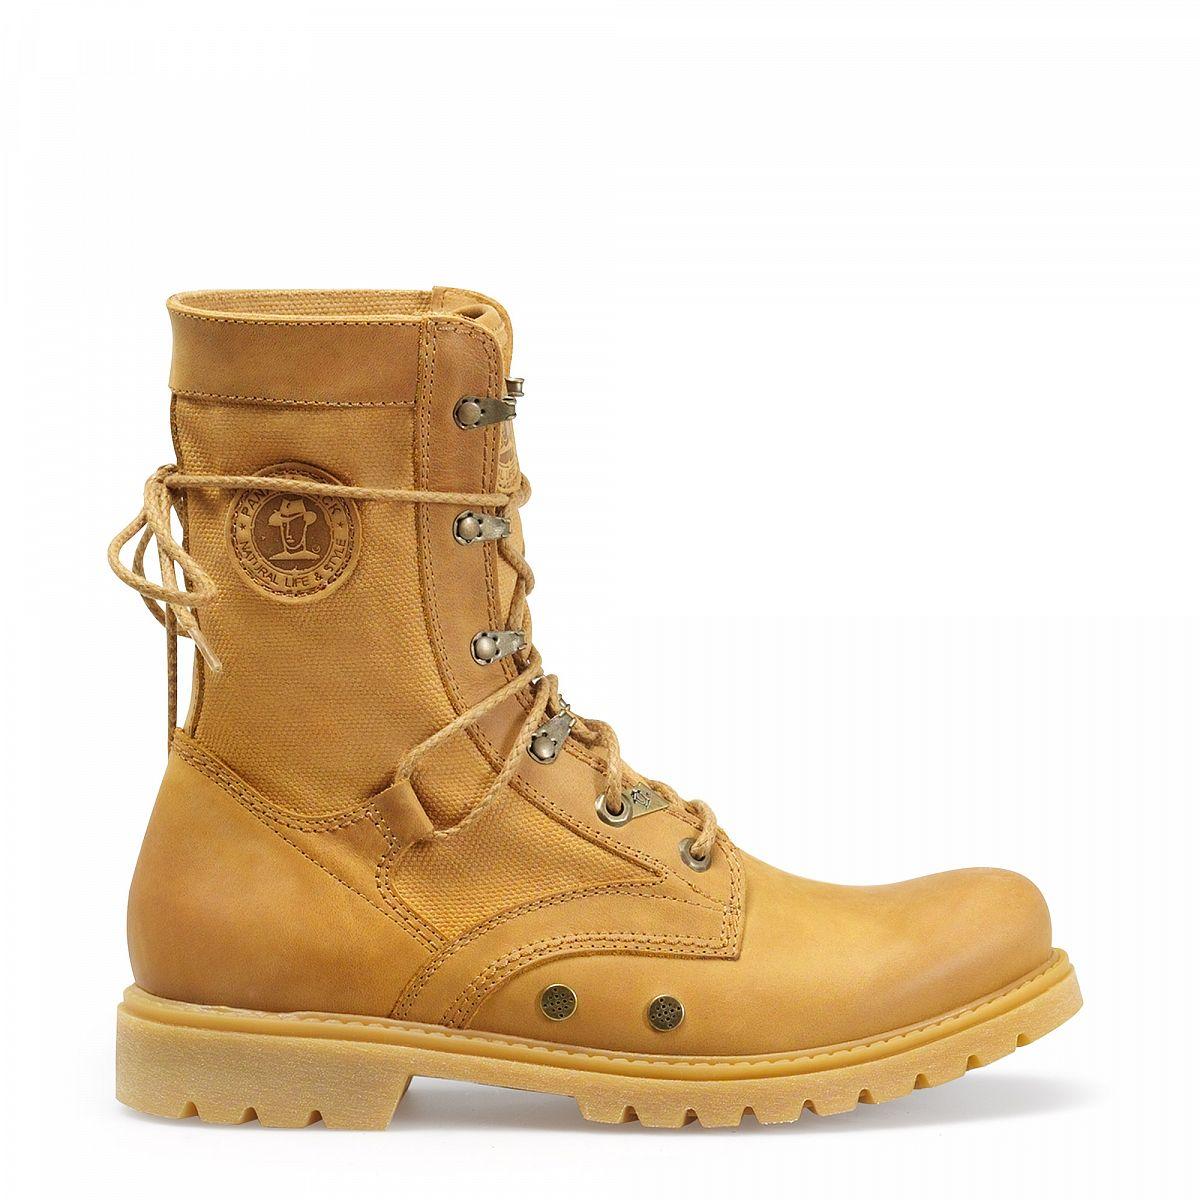 1a33014547c332 Damenstiefel Route Boot Vintage